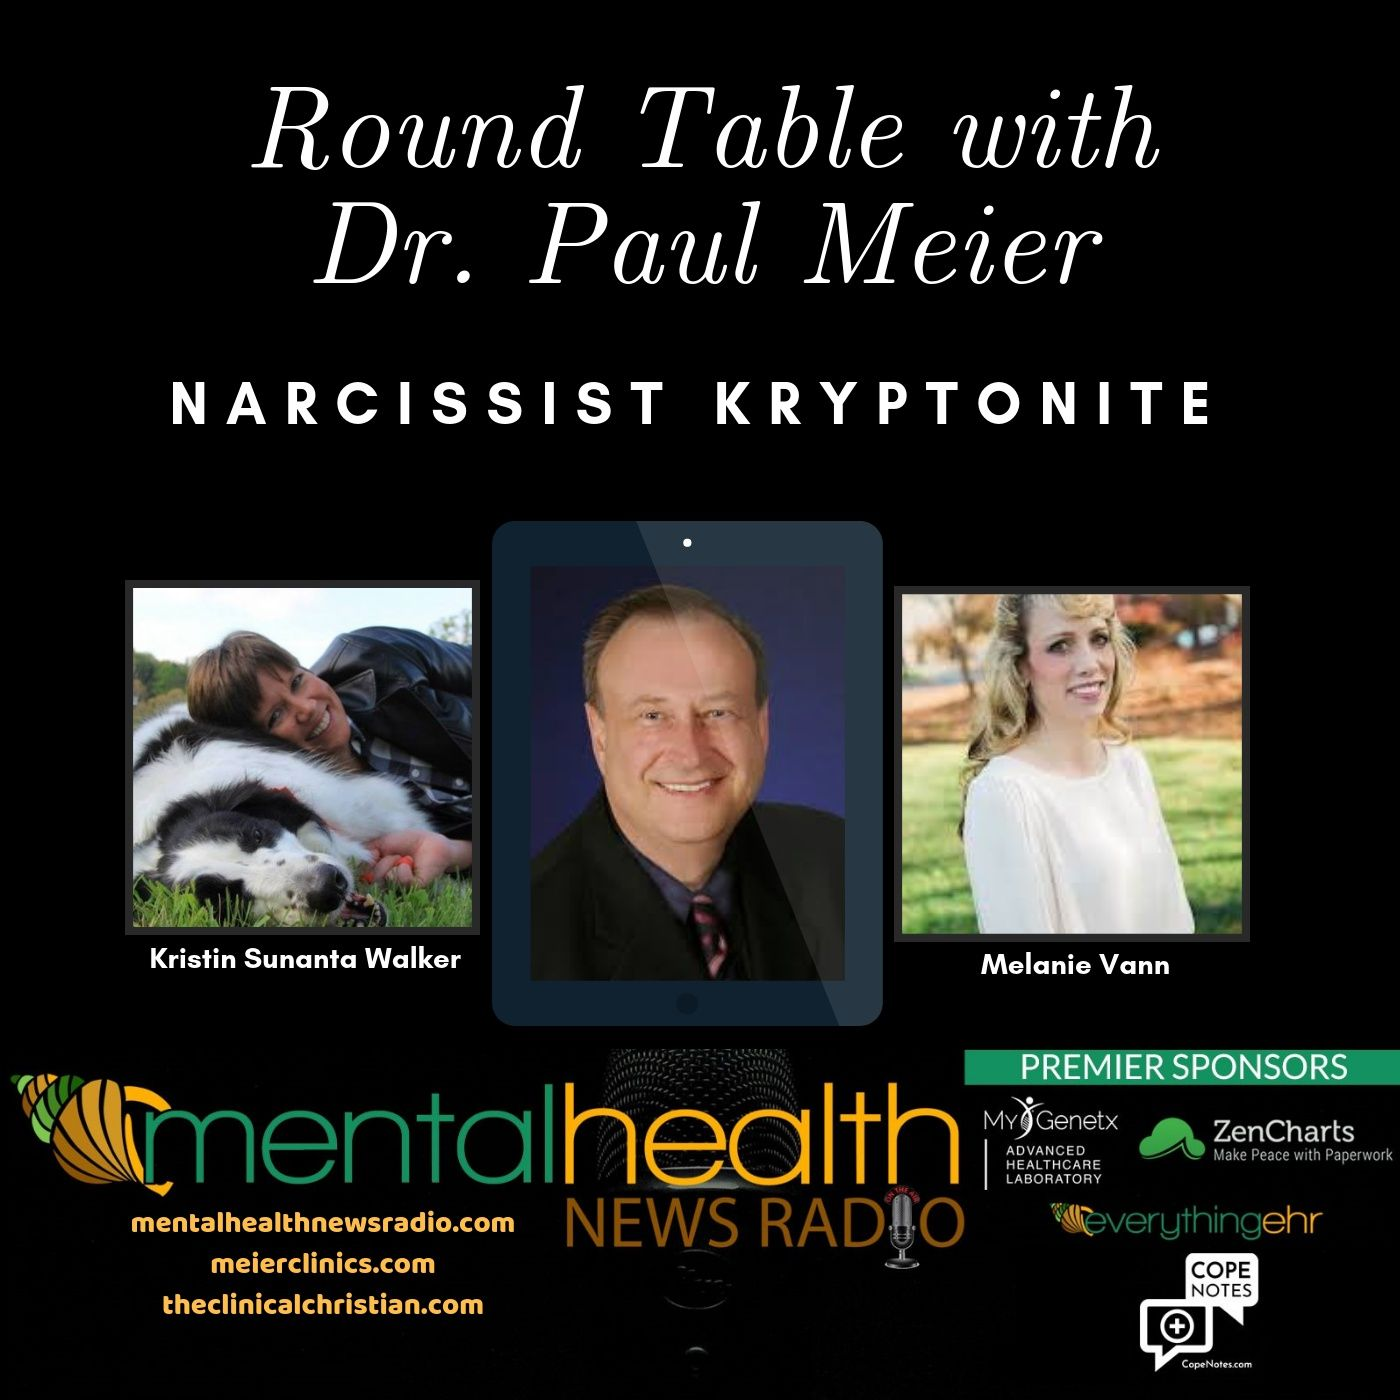 Mental Health News Radio - Round Table with Dr. Paul Meier:Narcissist Kryptonite